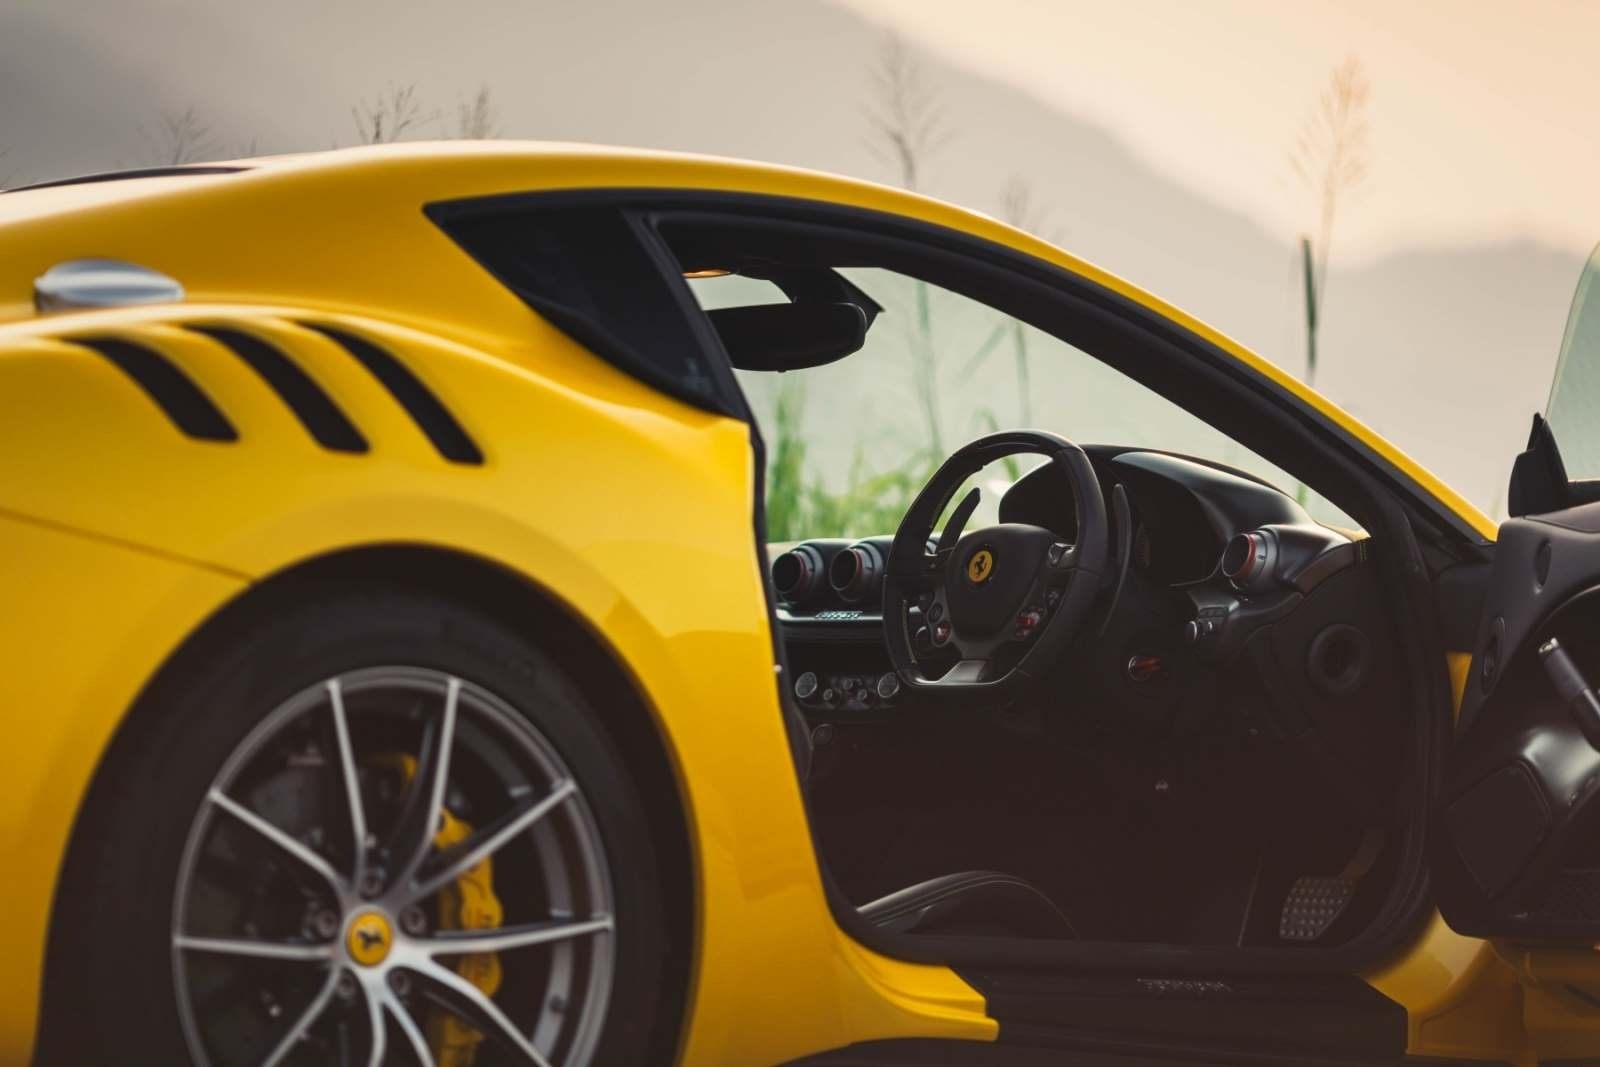 Ferrari F12 Tdf For Sale Vehicle Sales Dk Engineering